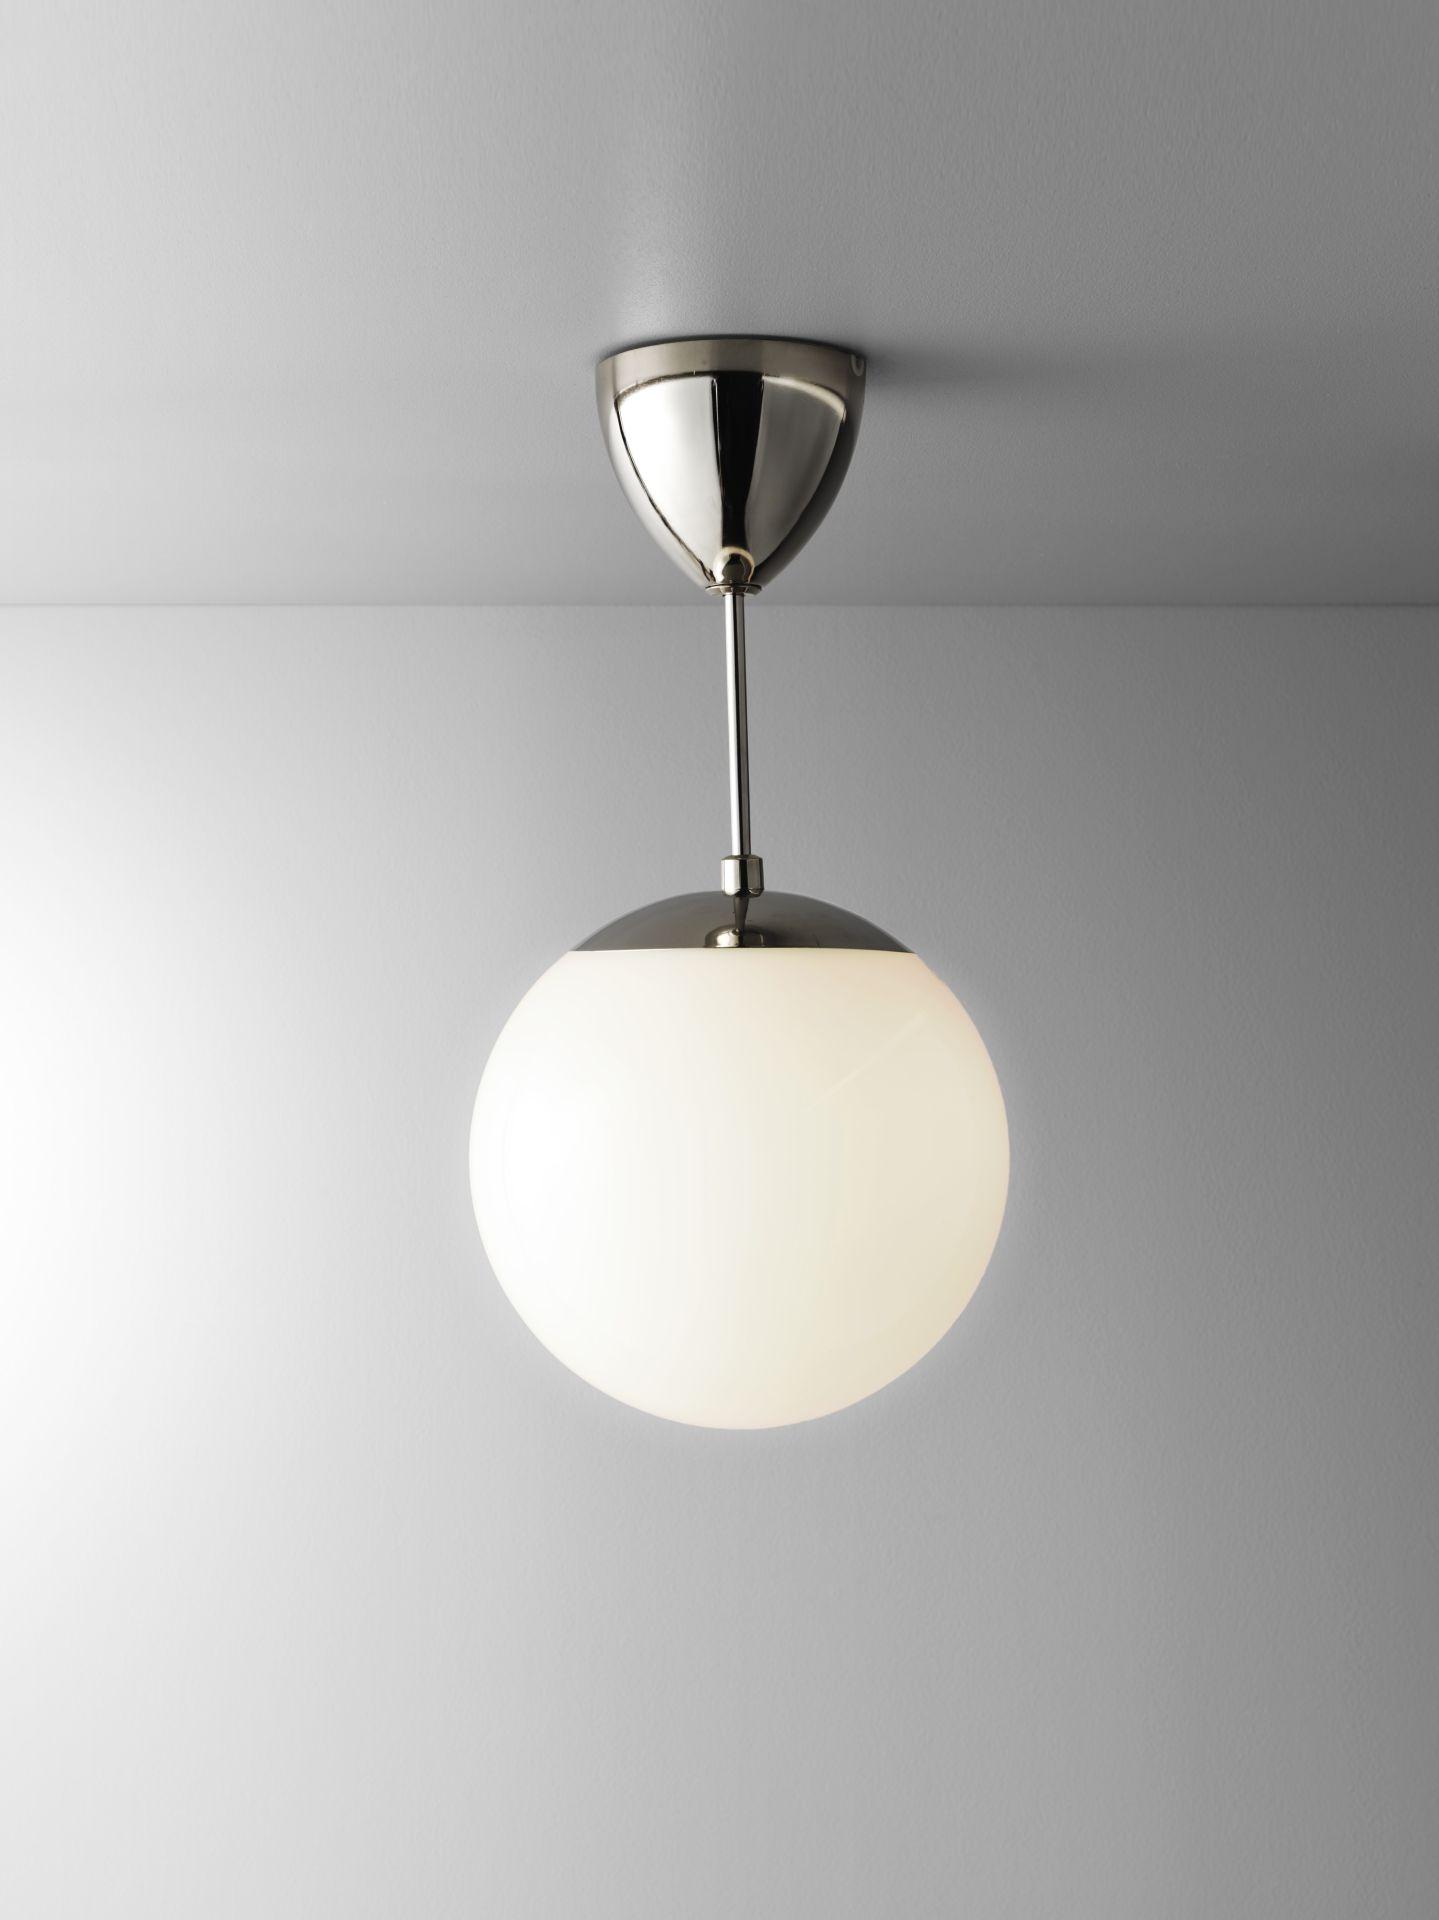 Holjes Pendellamp Wit Ikea Verlichting Ikea Plafondlamp